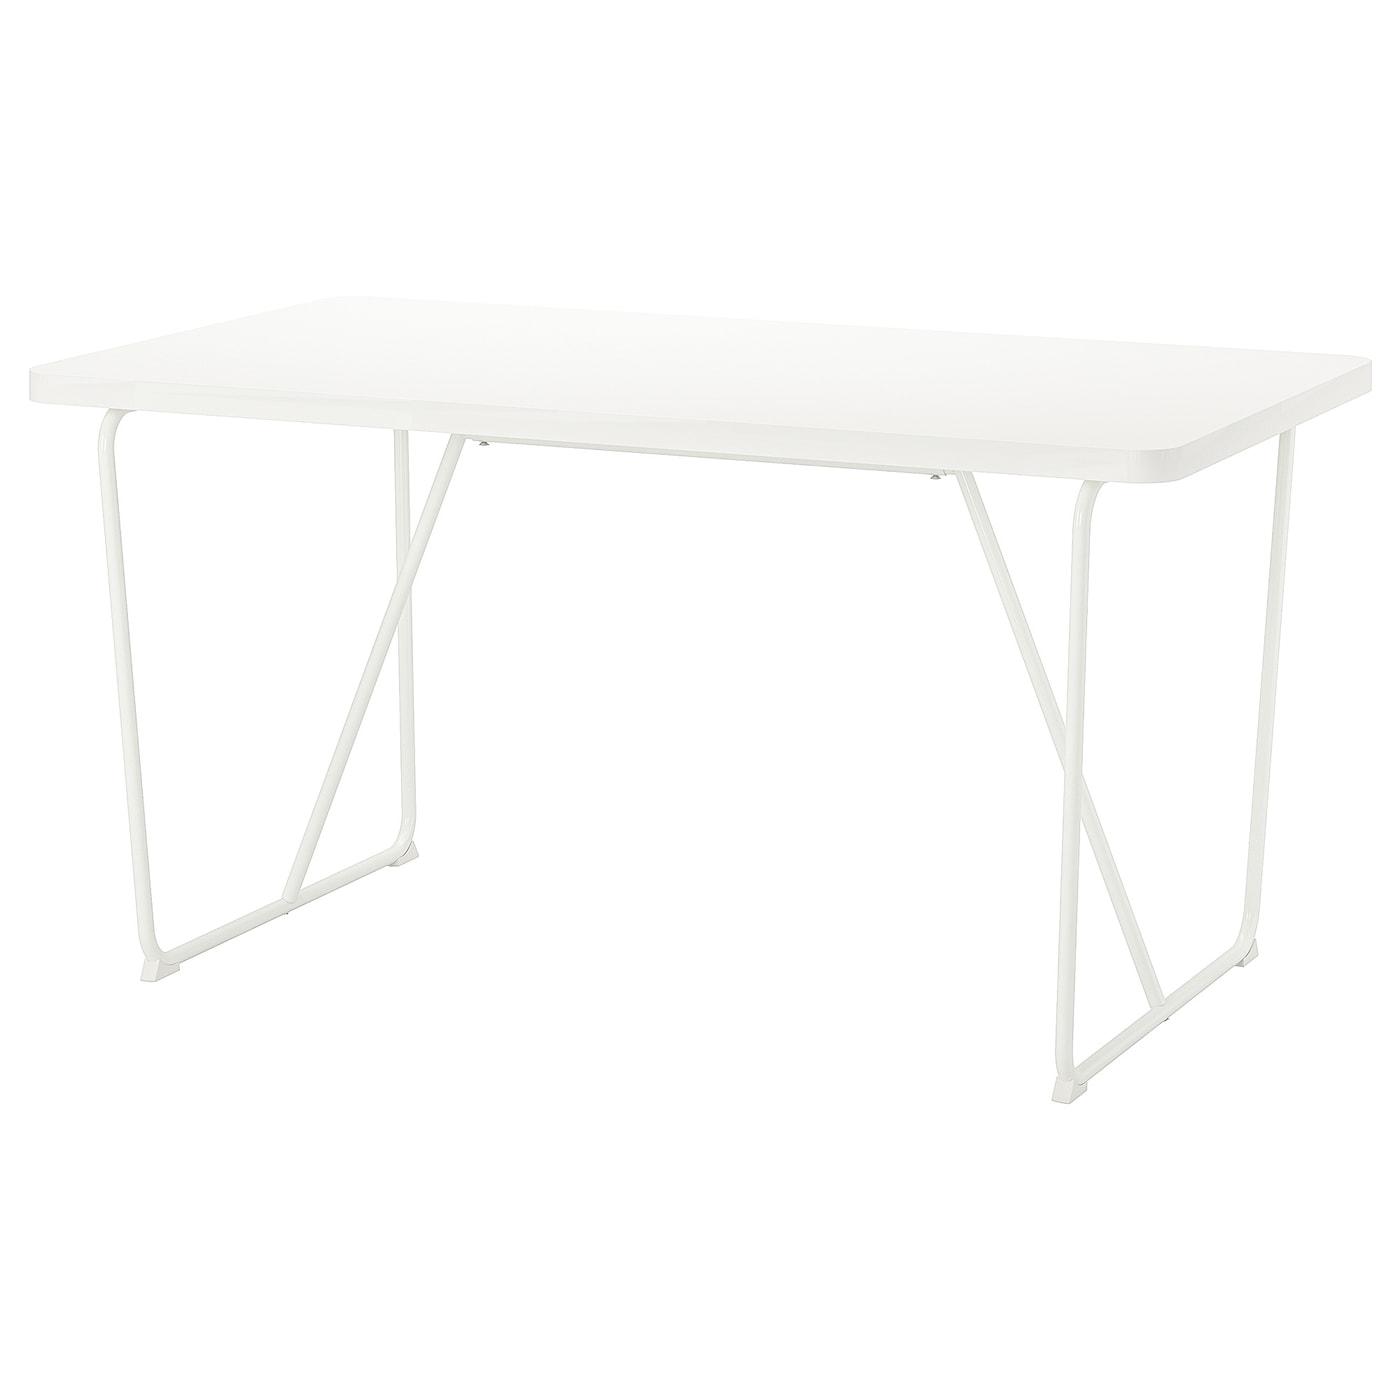 IKEA RYDEBÄCK Stół, biały, Backaryd biały, 150x78 cm